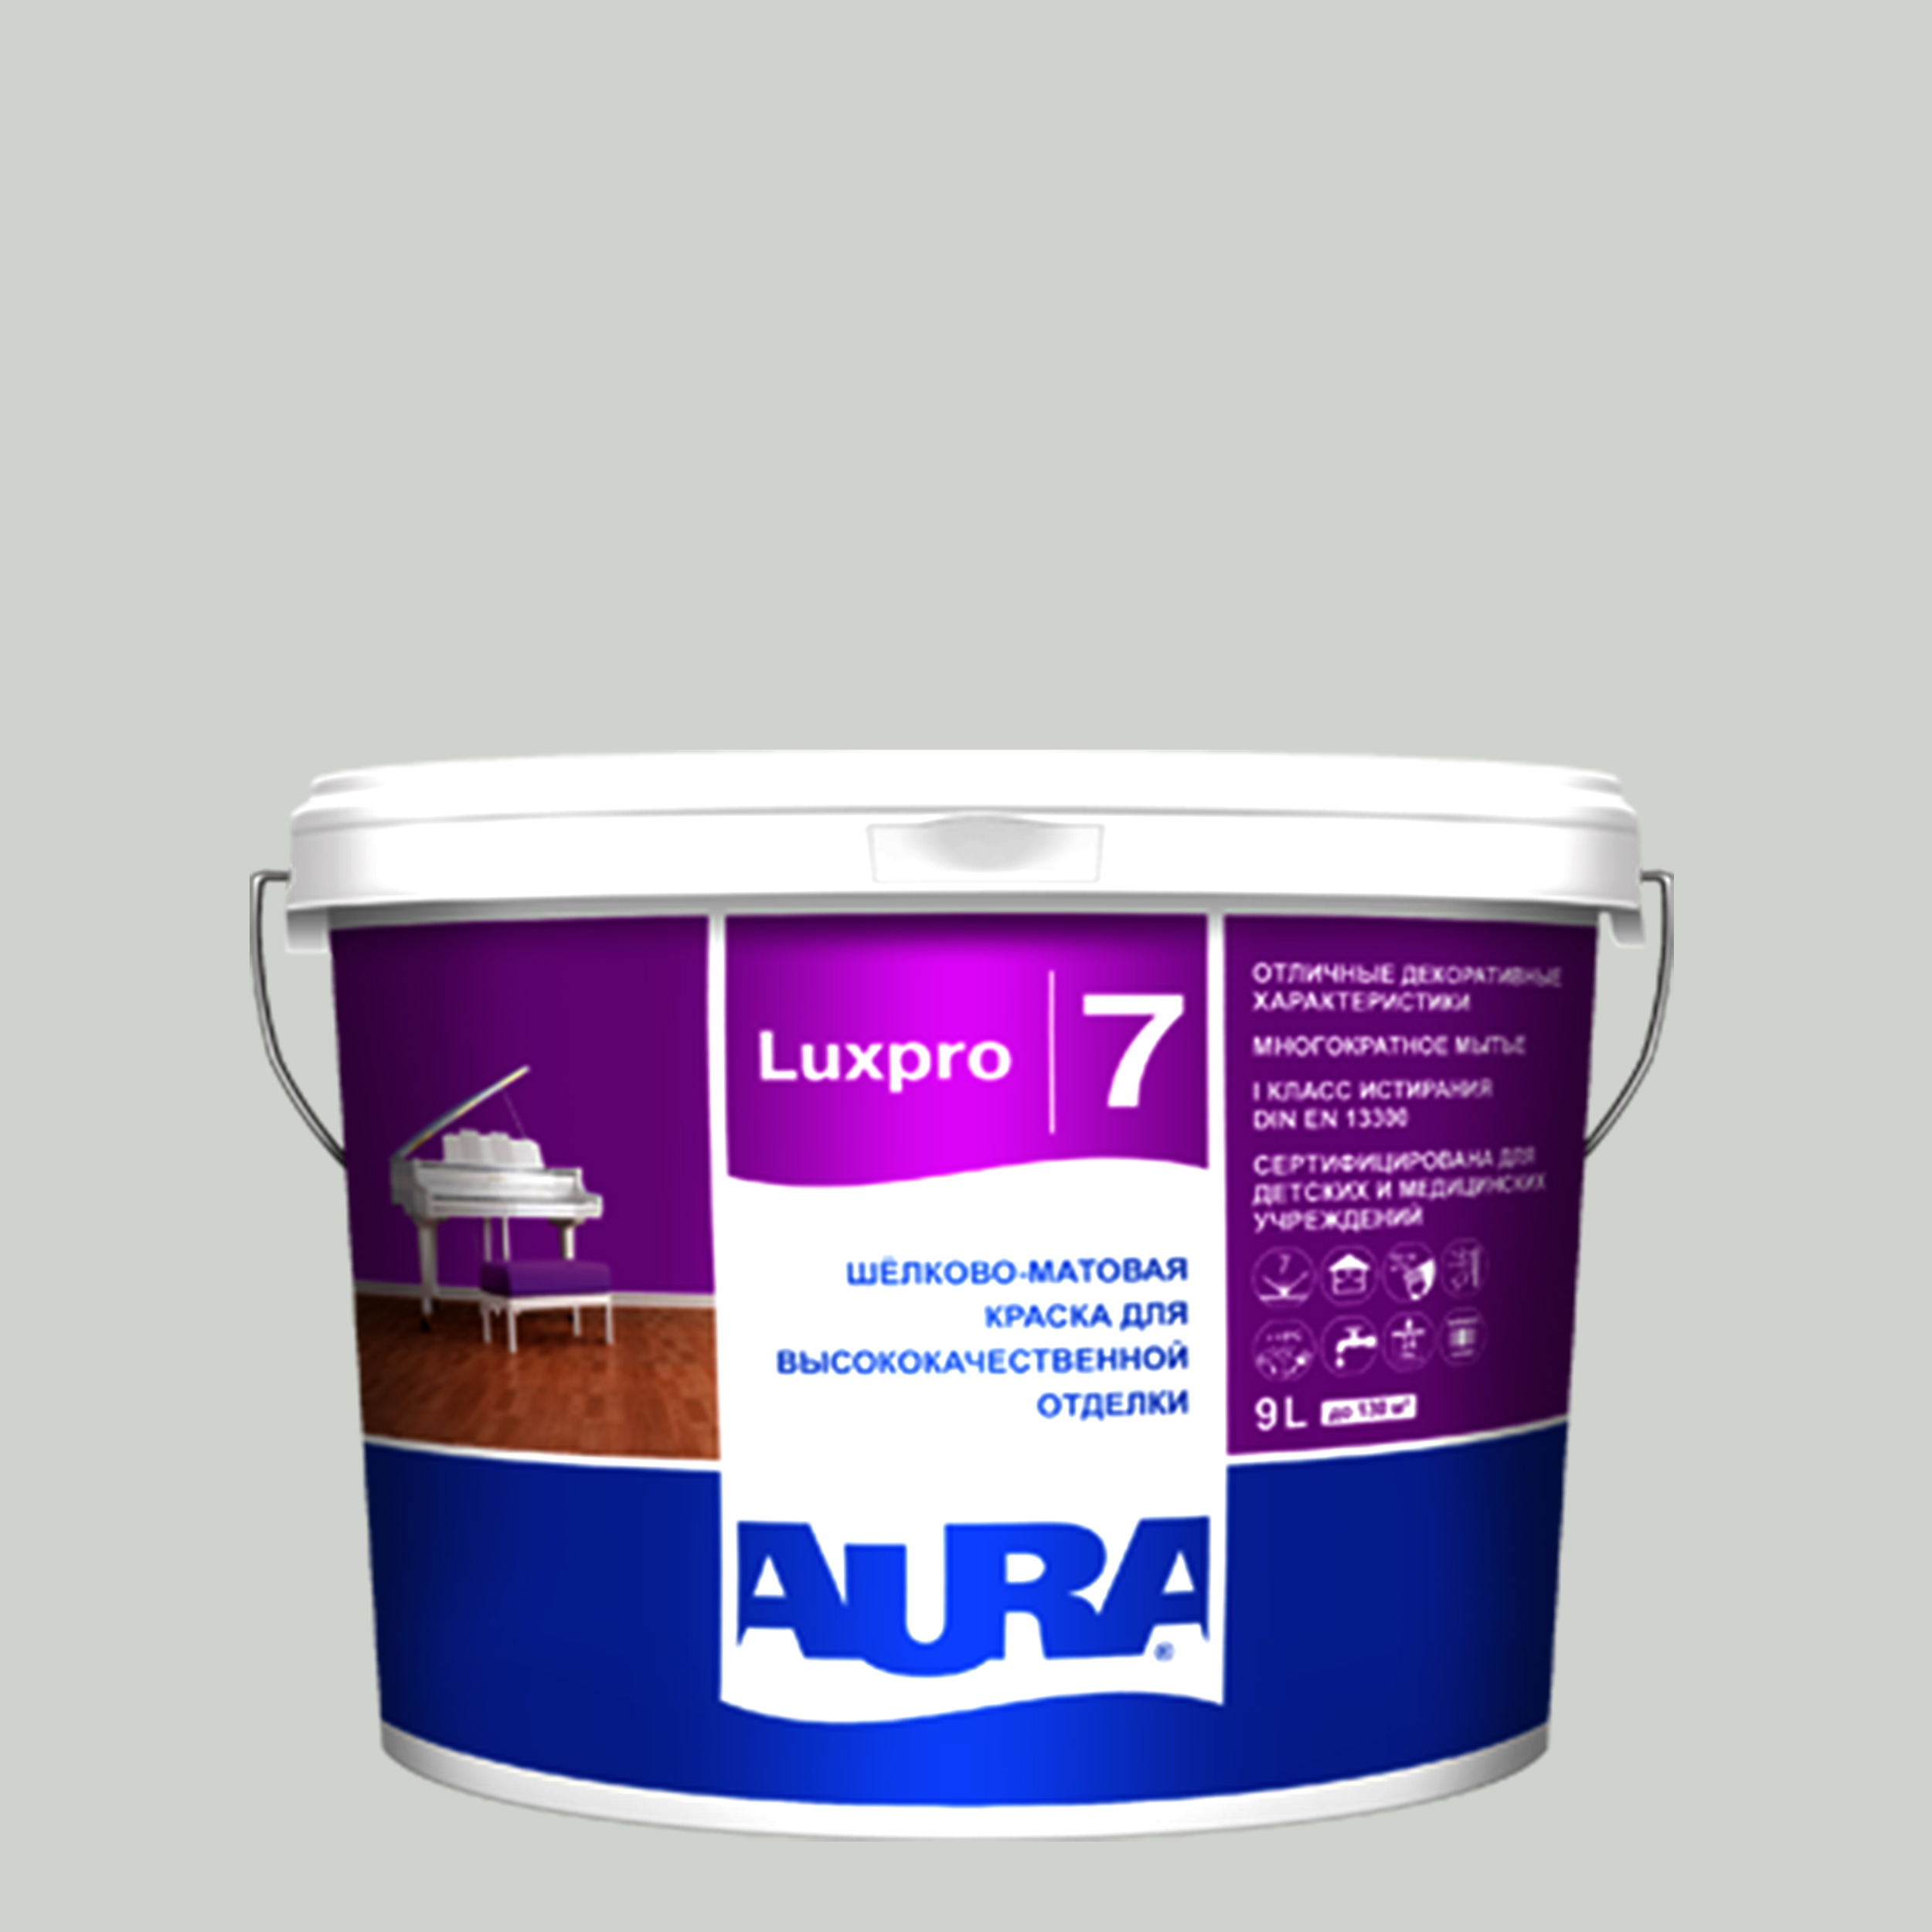 Фото 4 - Краска интерьерная, Aura LuxPRO 7, RAL 3004, 11 кг.